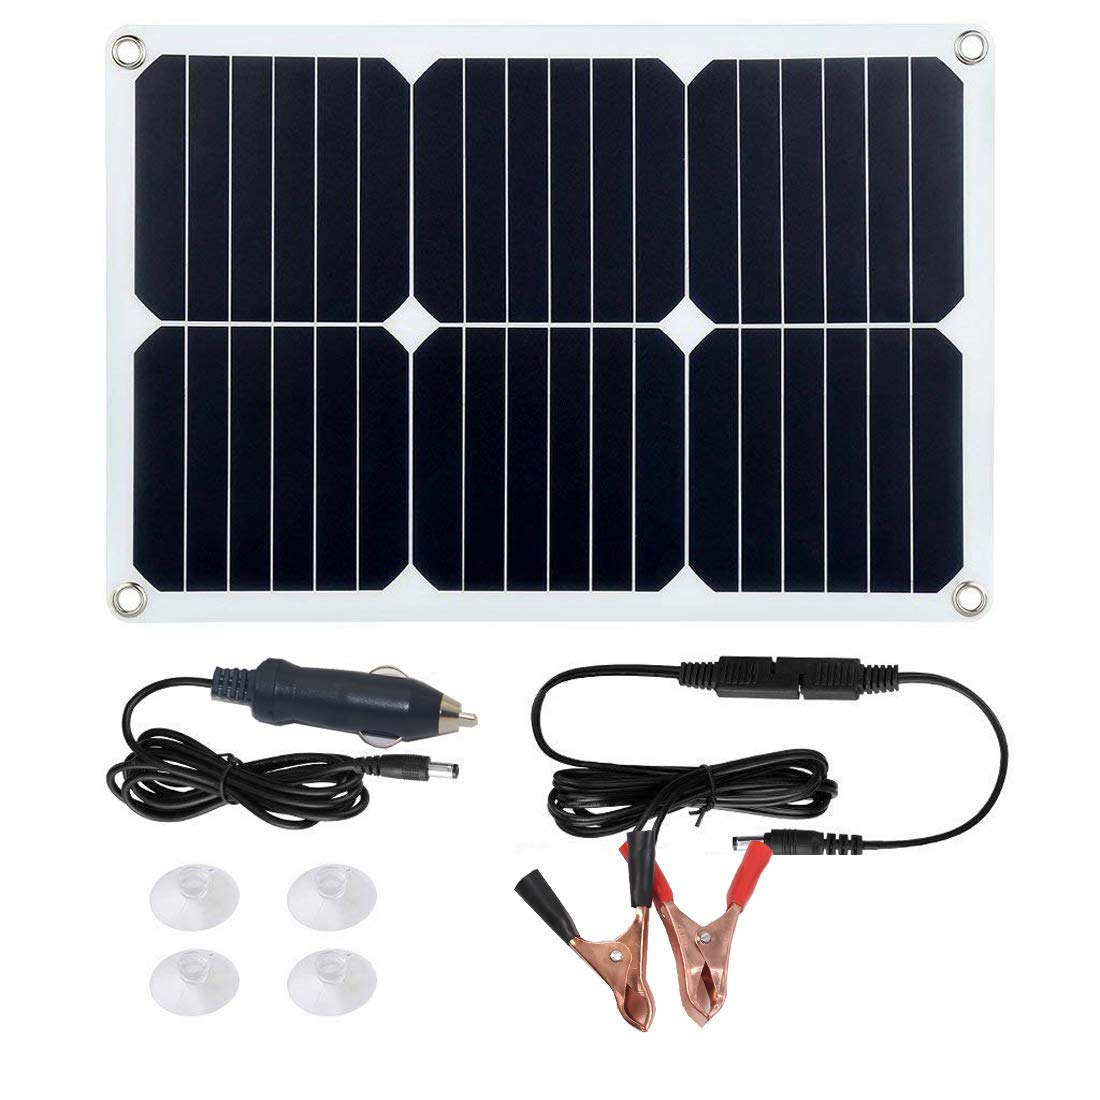 Betop-camp Tragbares Solar-Panel-Auto-Akku-Ladegerä t 18 Volt 18 Watt Zigarettenanzü nder Stecker, Batterie-ladeclip-Linie, Saugnä pfe, Batterie-Betreuer fü r Motorrad